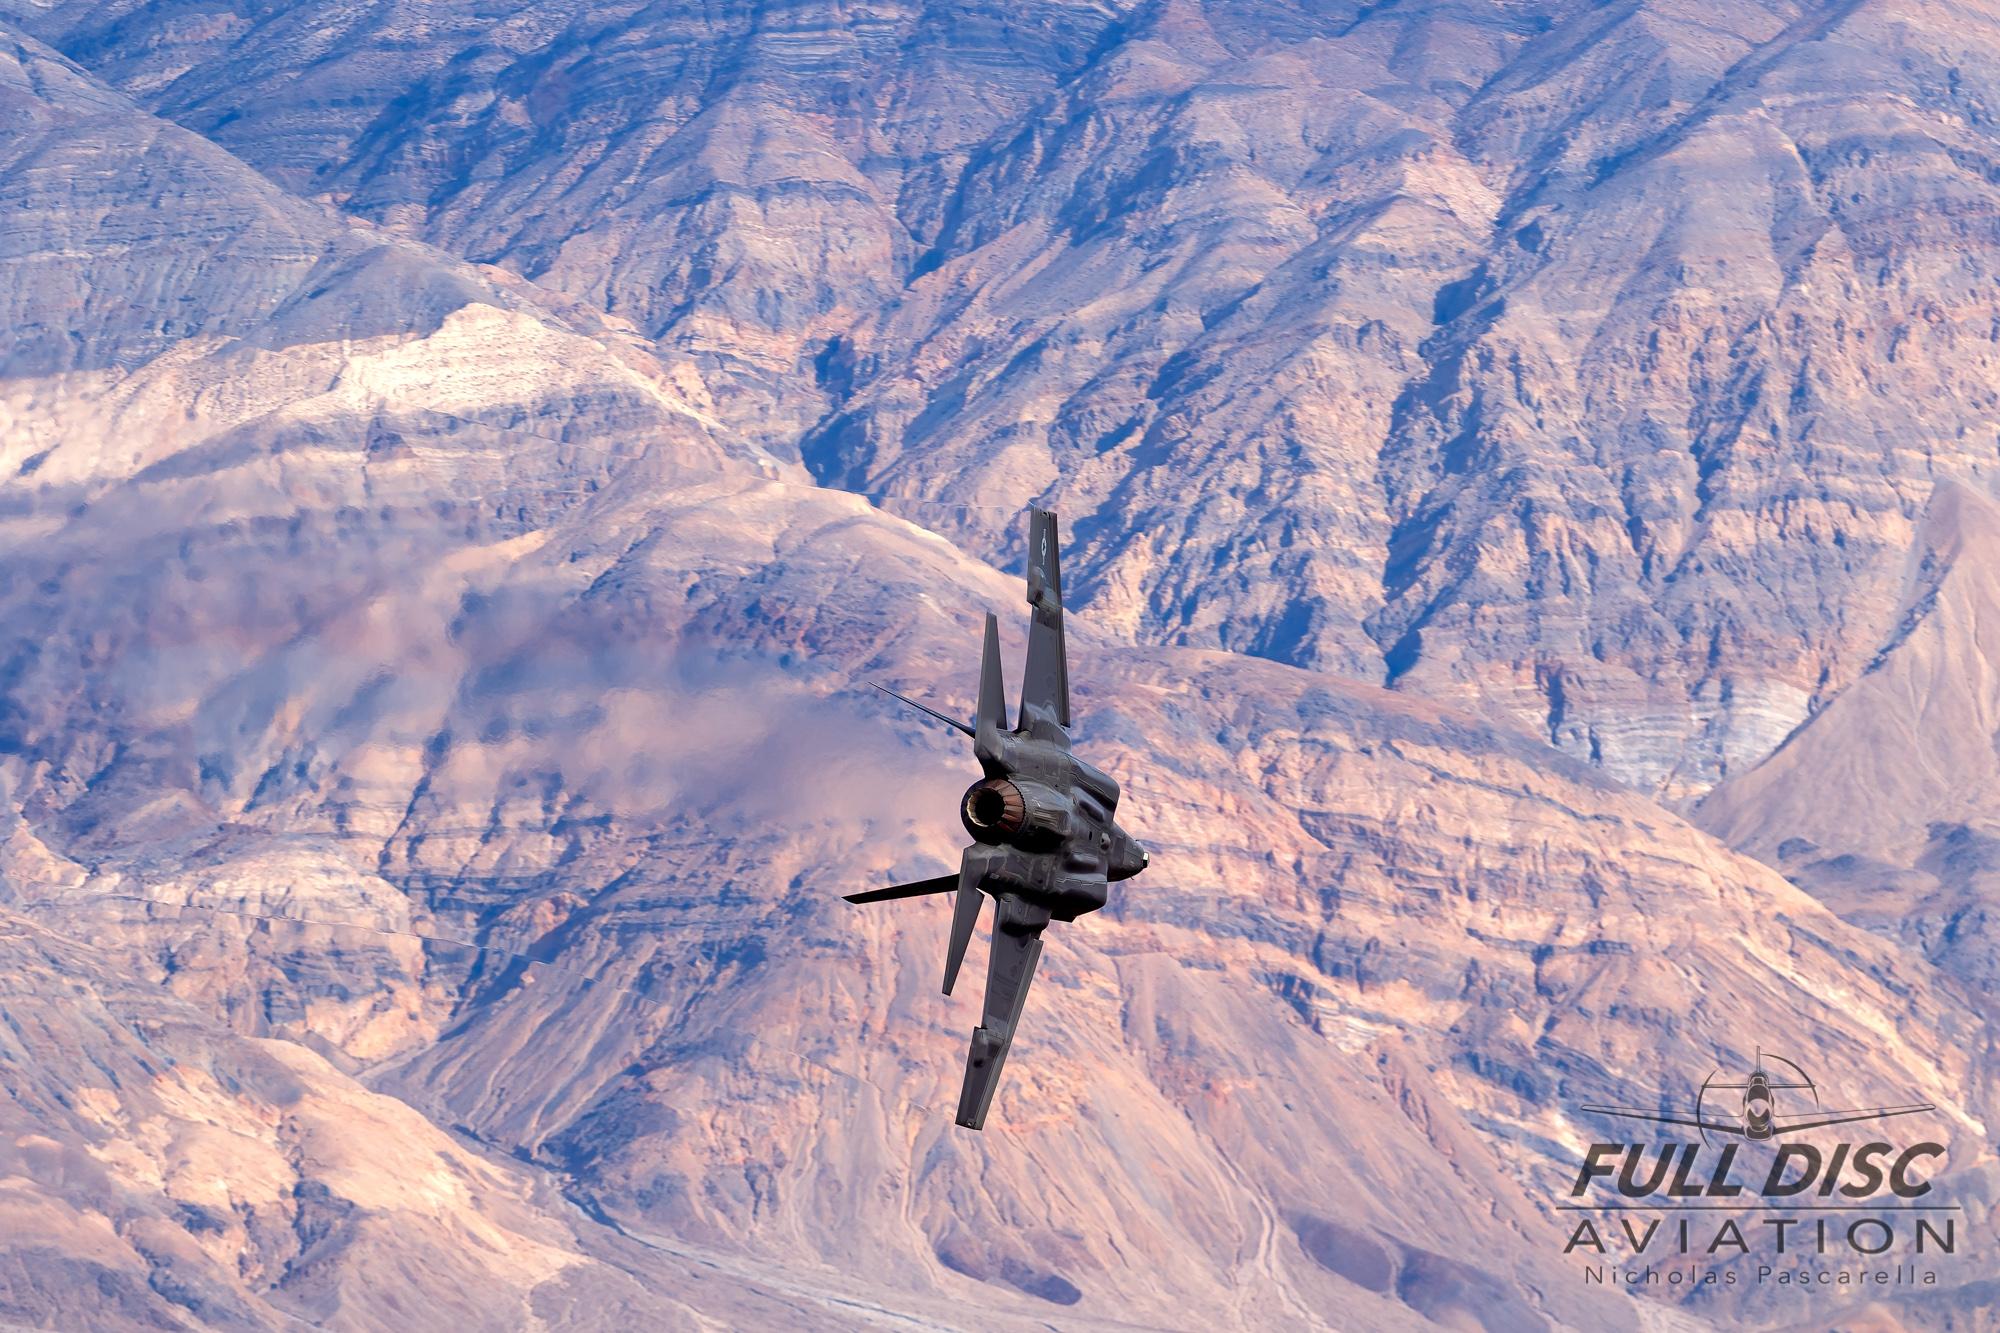 nickpascarella_nicholaspascarella_fulldiscaviation_aircraft_starwarscanyon_jeditransition_f35.jpg